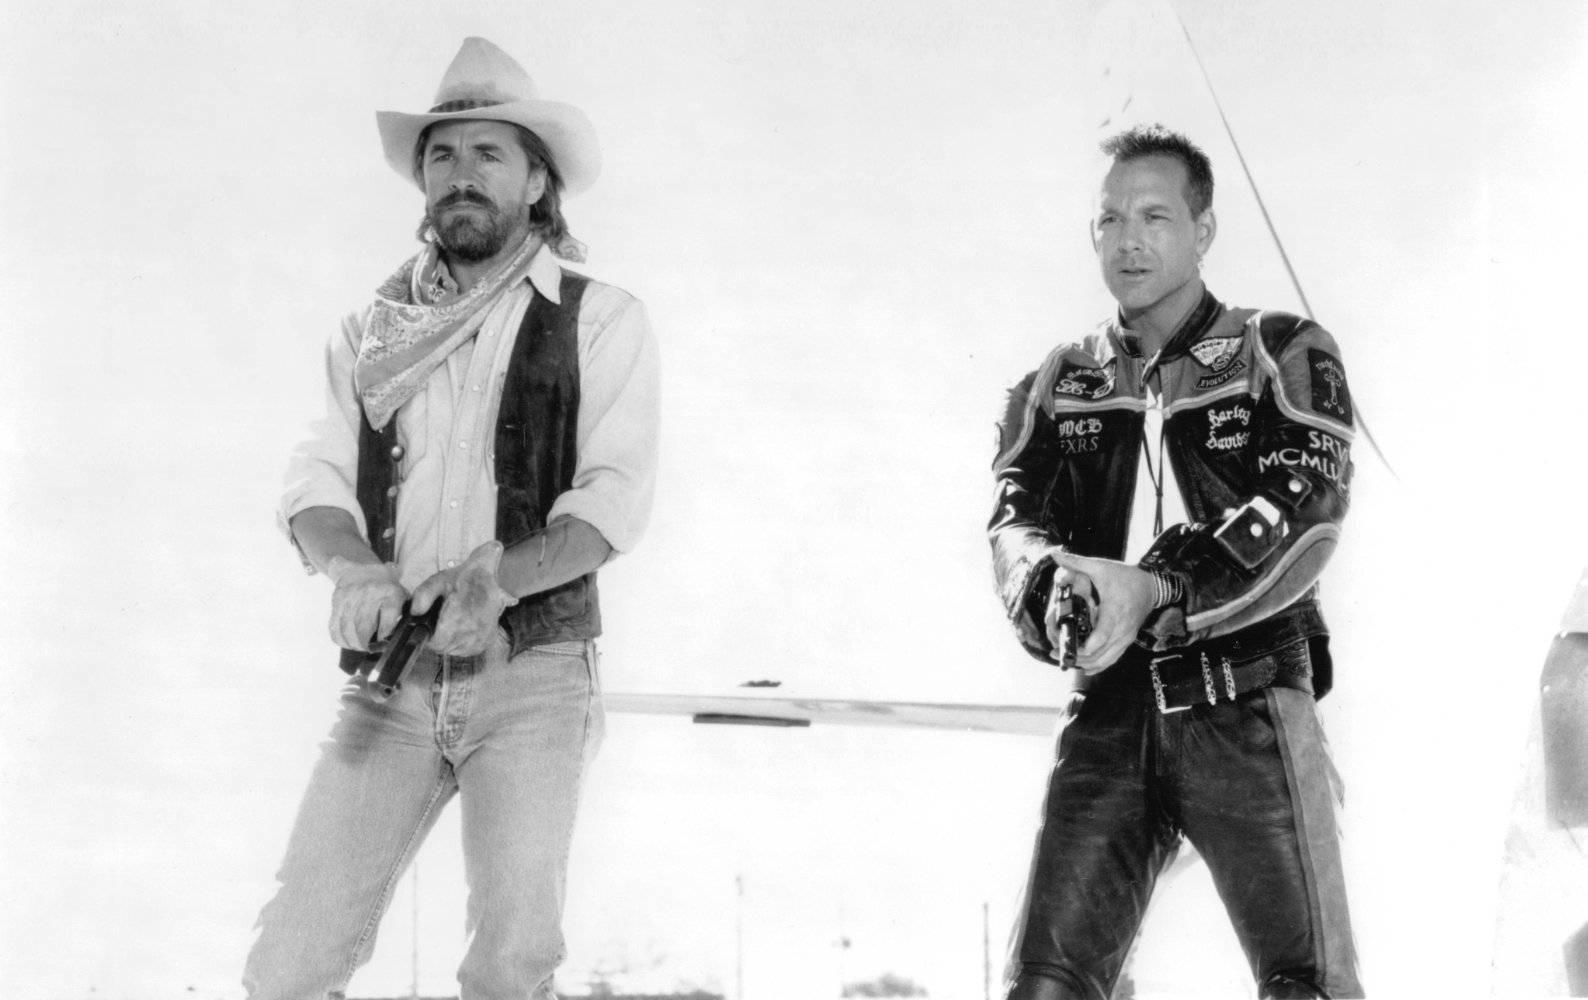 Harley Davidson Movie: Harley Davidson And The Marlboro Man 1991 Full Movie Watch